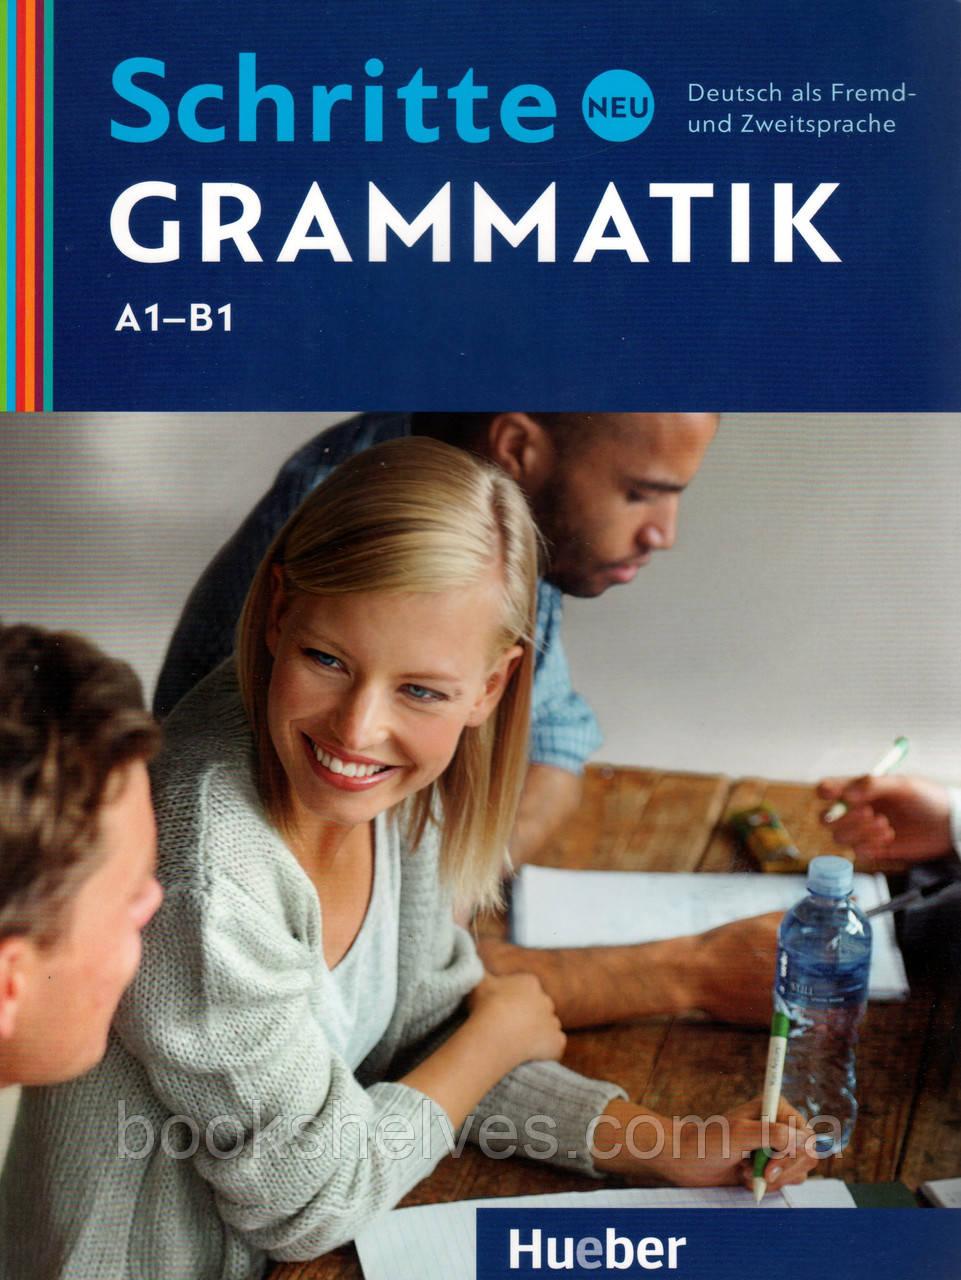 Грамматика немецкого  Schritte Neu Grammatik